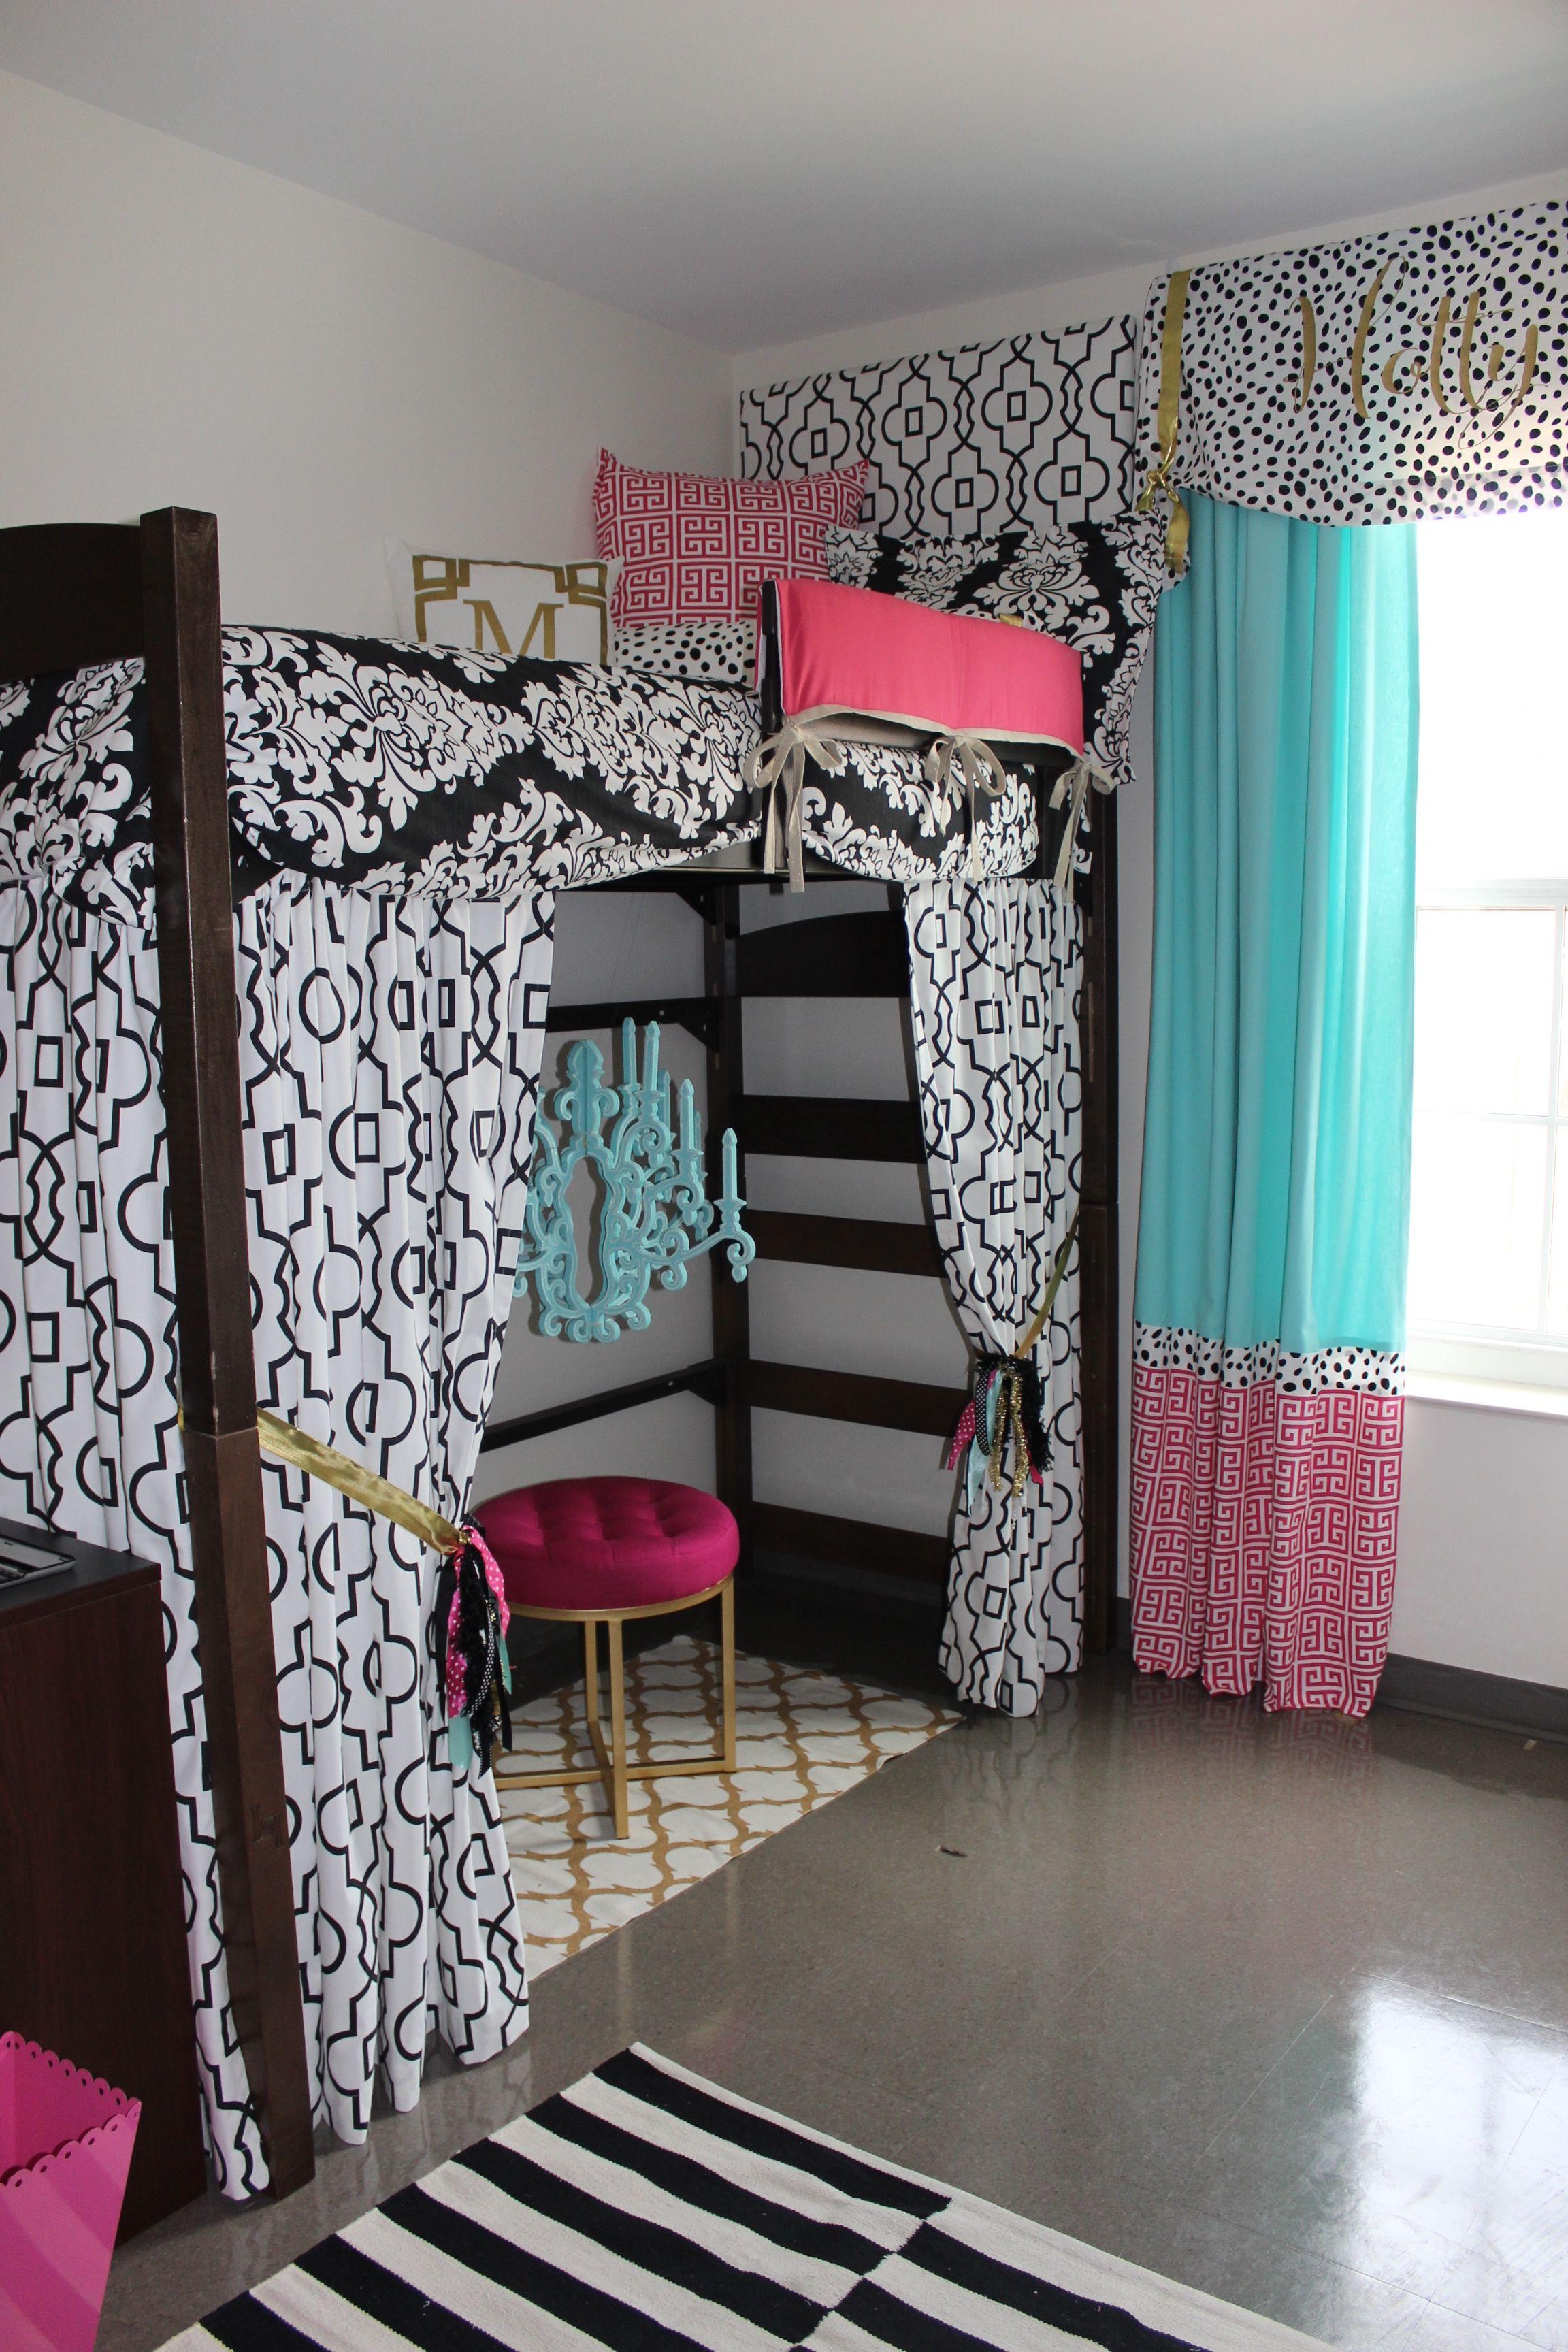 Preppy Gray Dorm Room Bedding | Pink dorm rooms, Dorm room ...